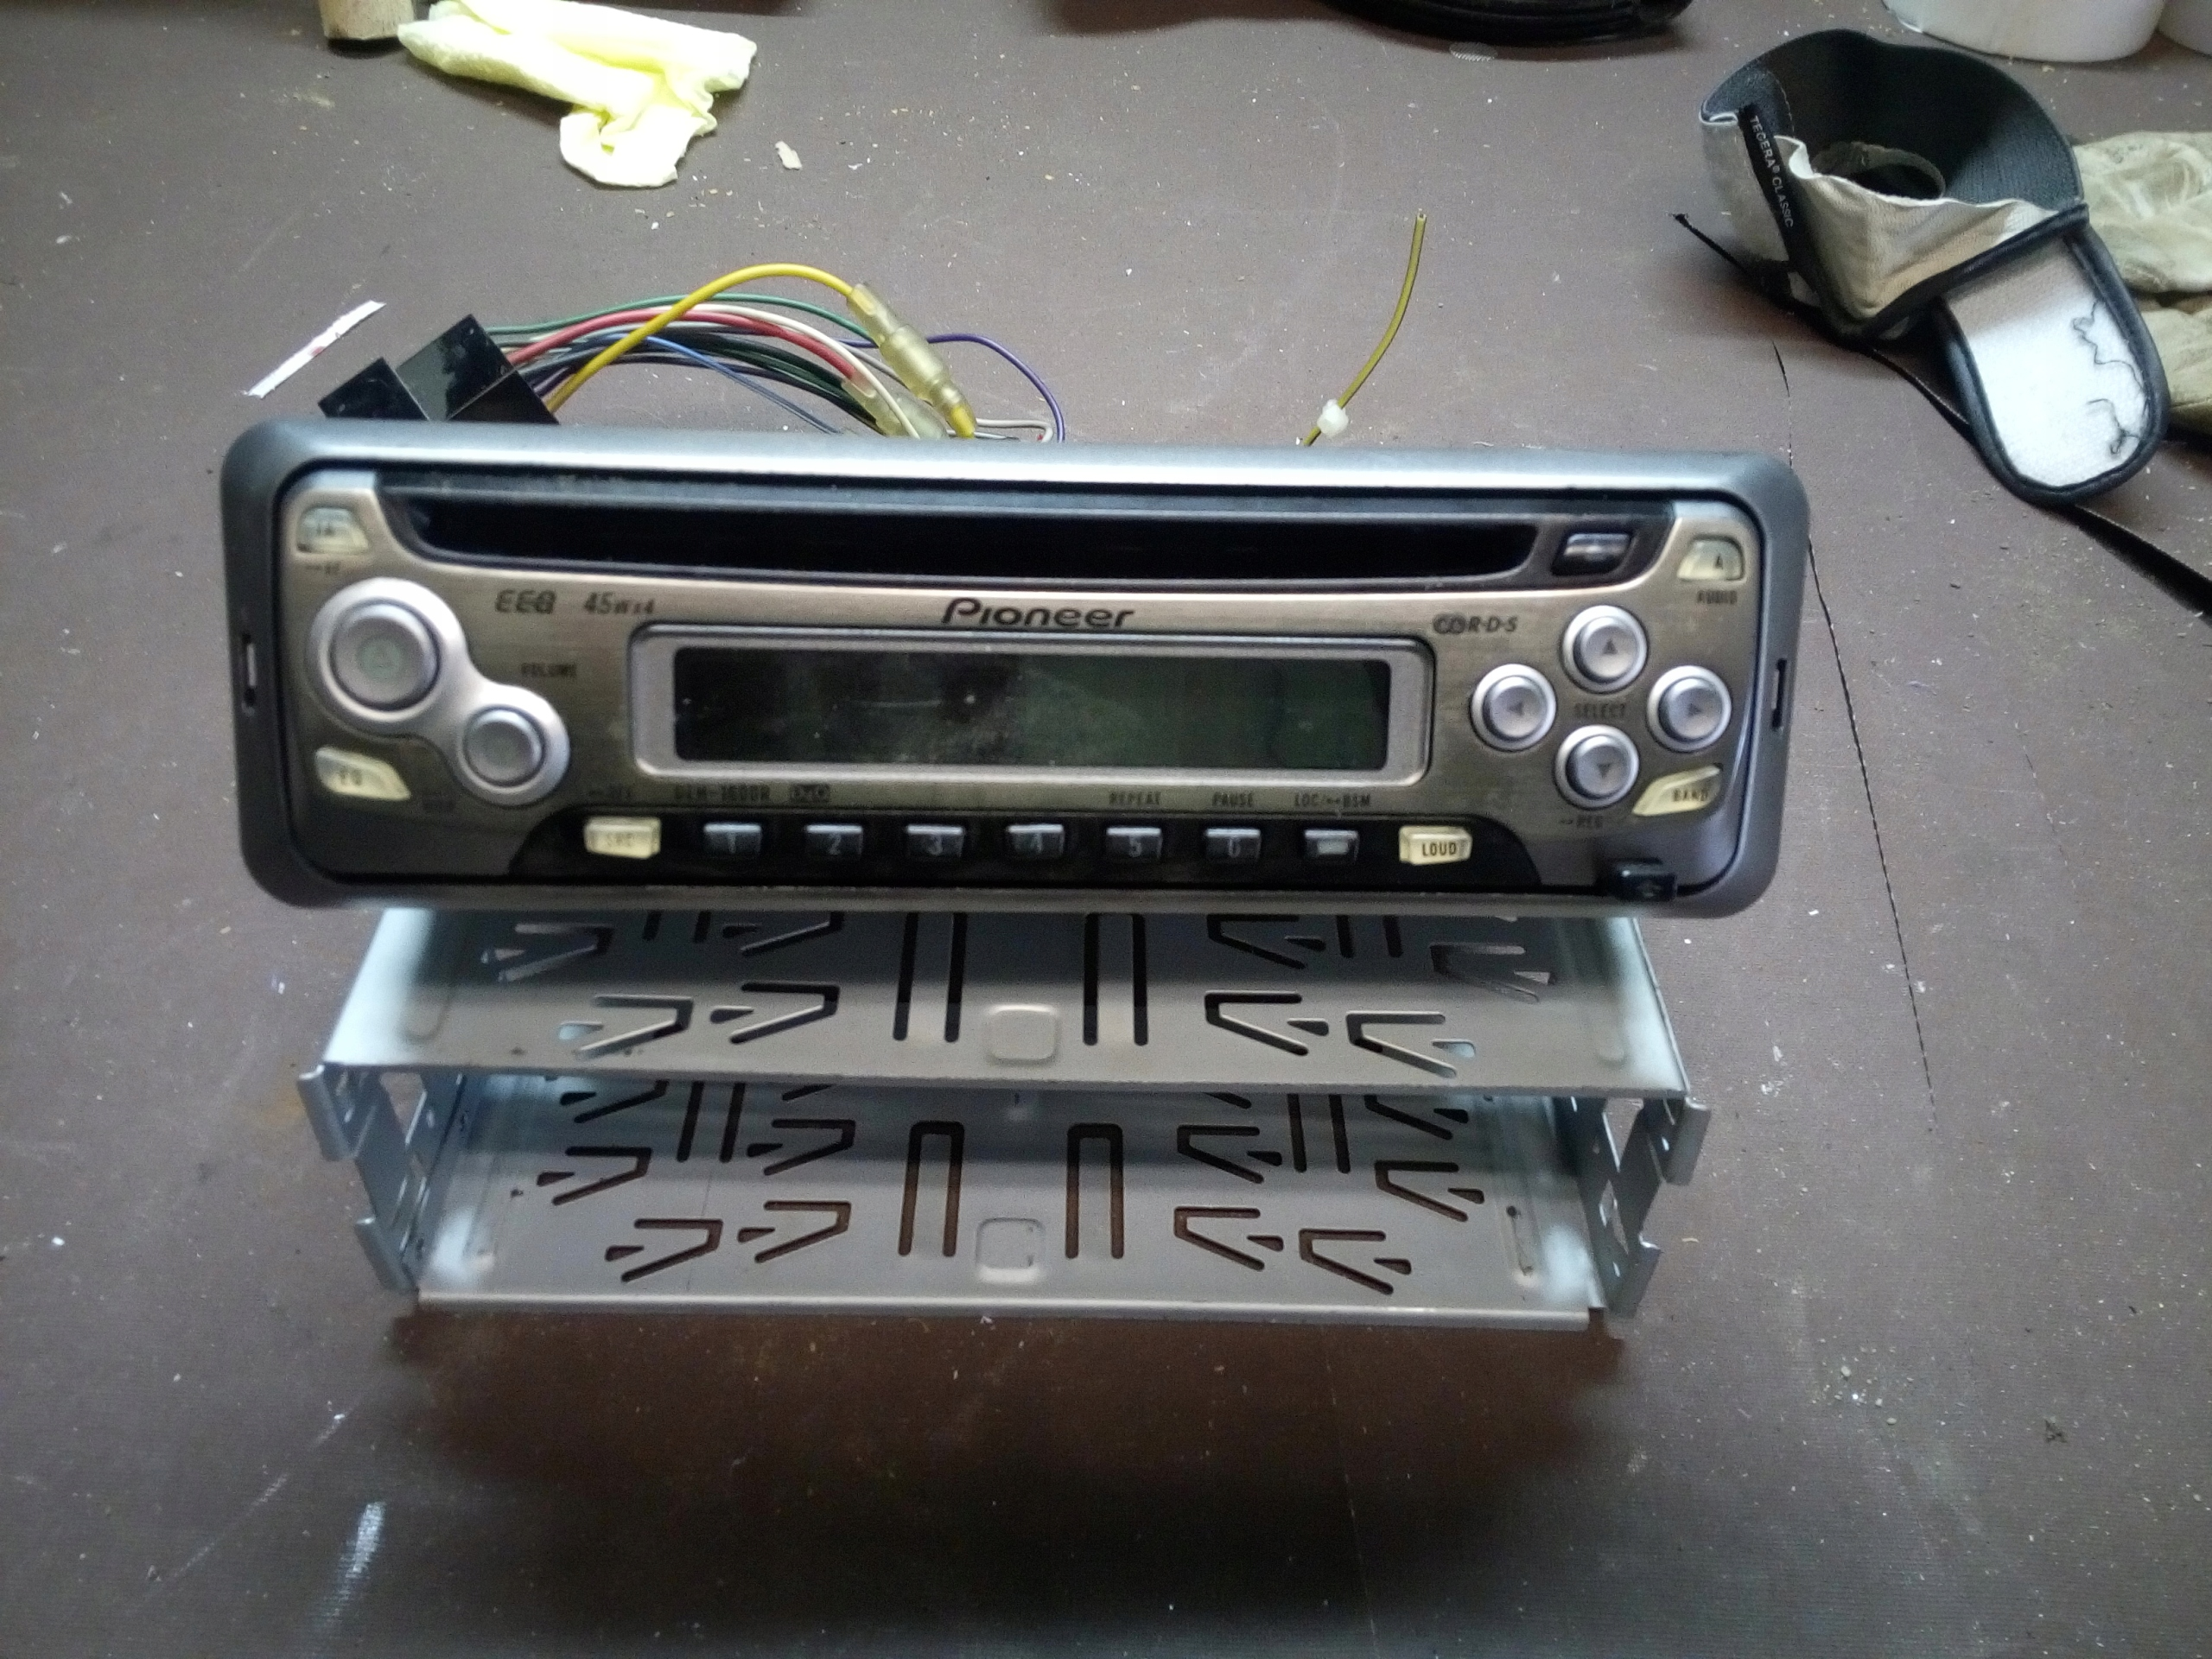 RADIOODTWARZACZ PIONEER DEH-1600R